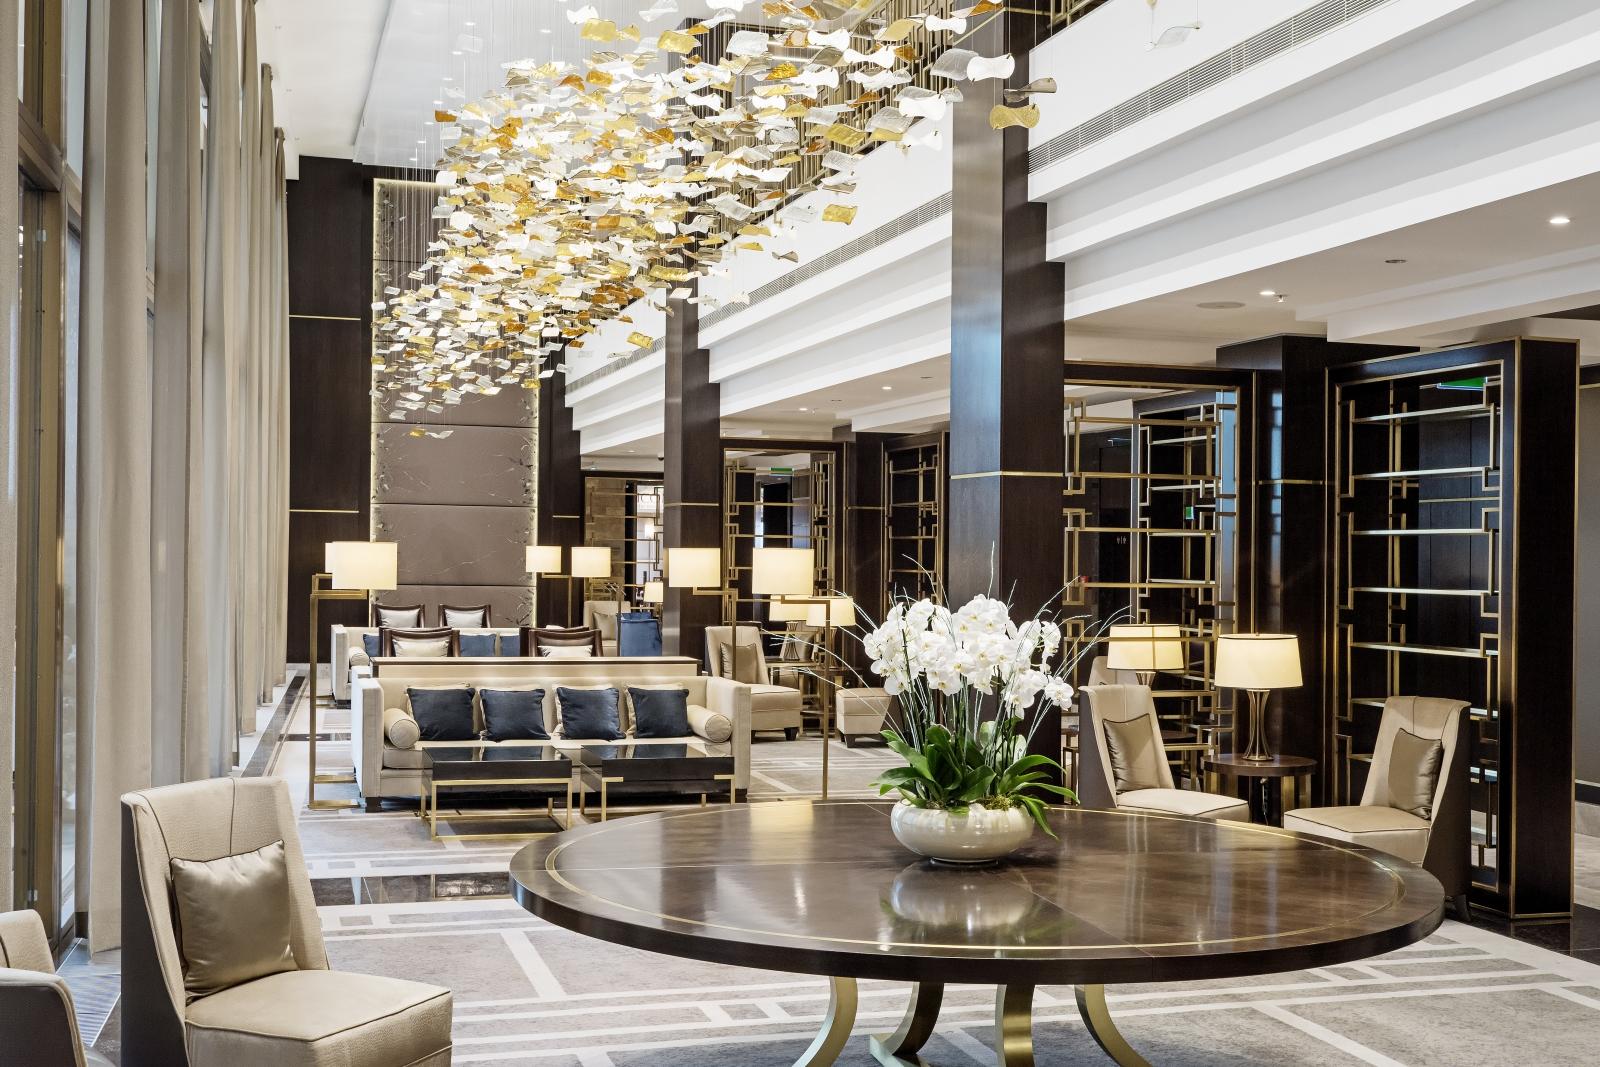 hilton-budapest-lobby-lounge